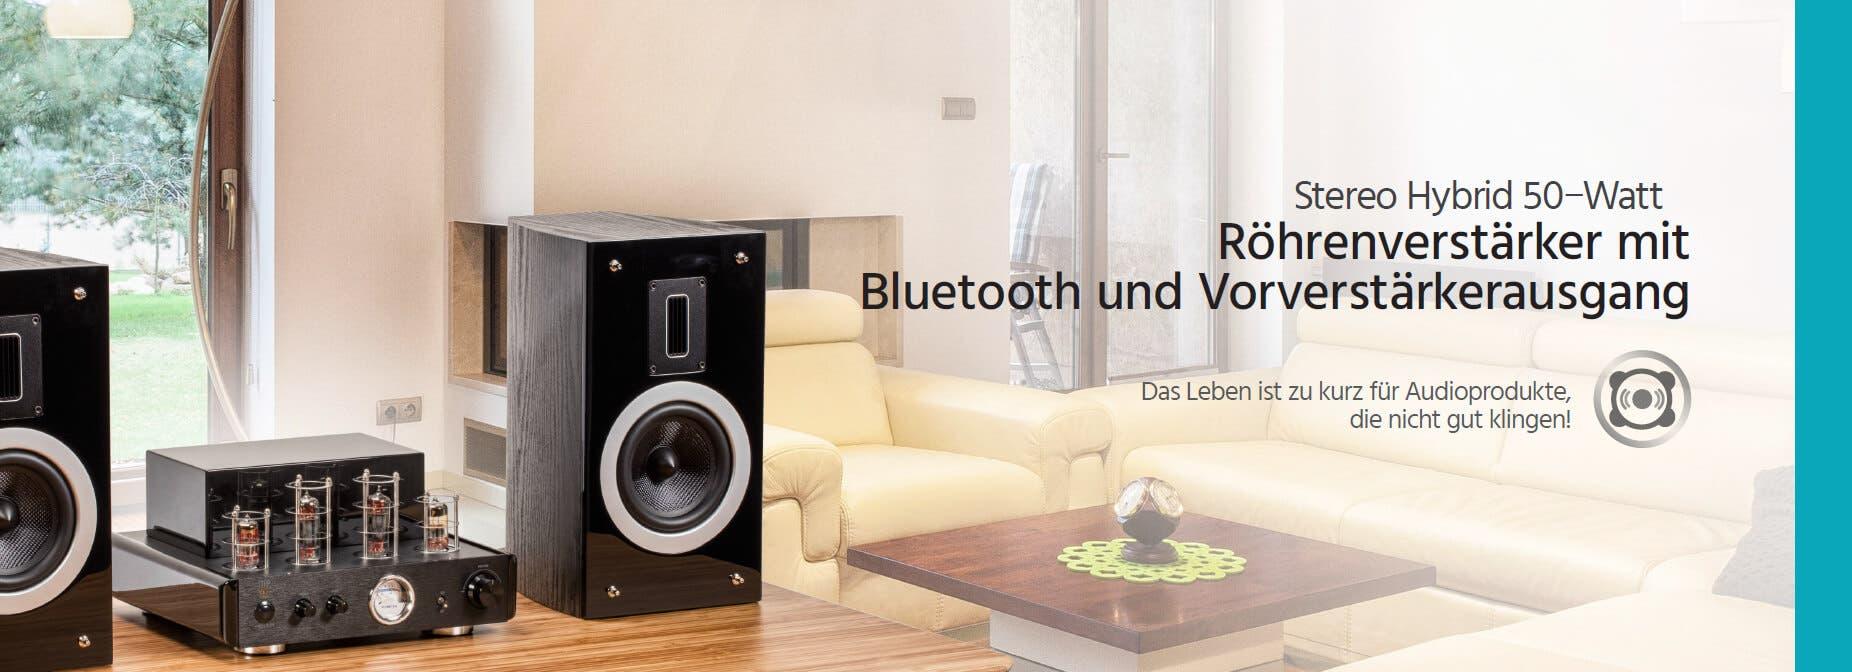 Röhrenverstärker mit Bluetooth